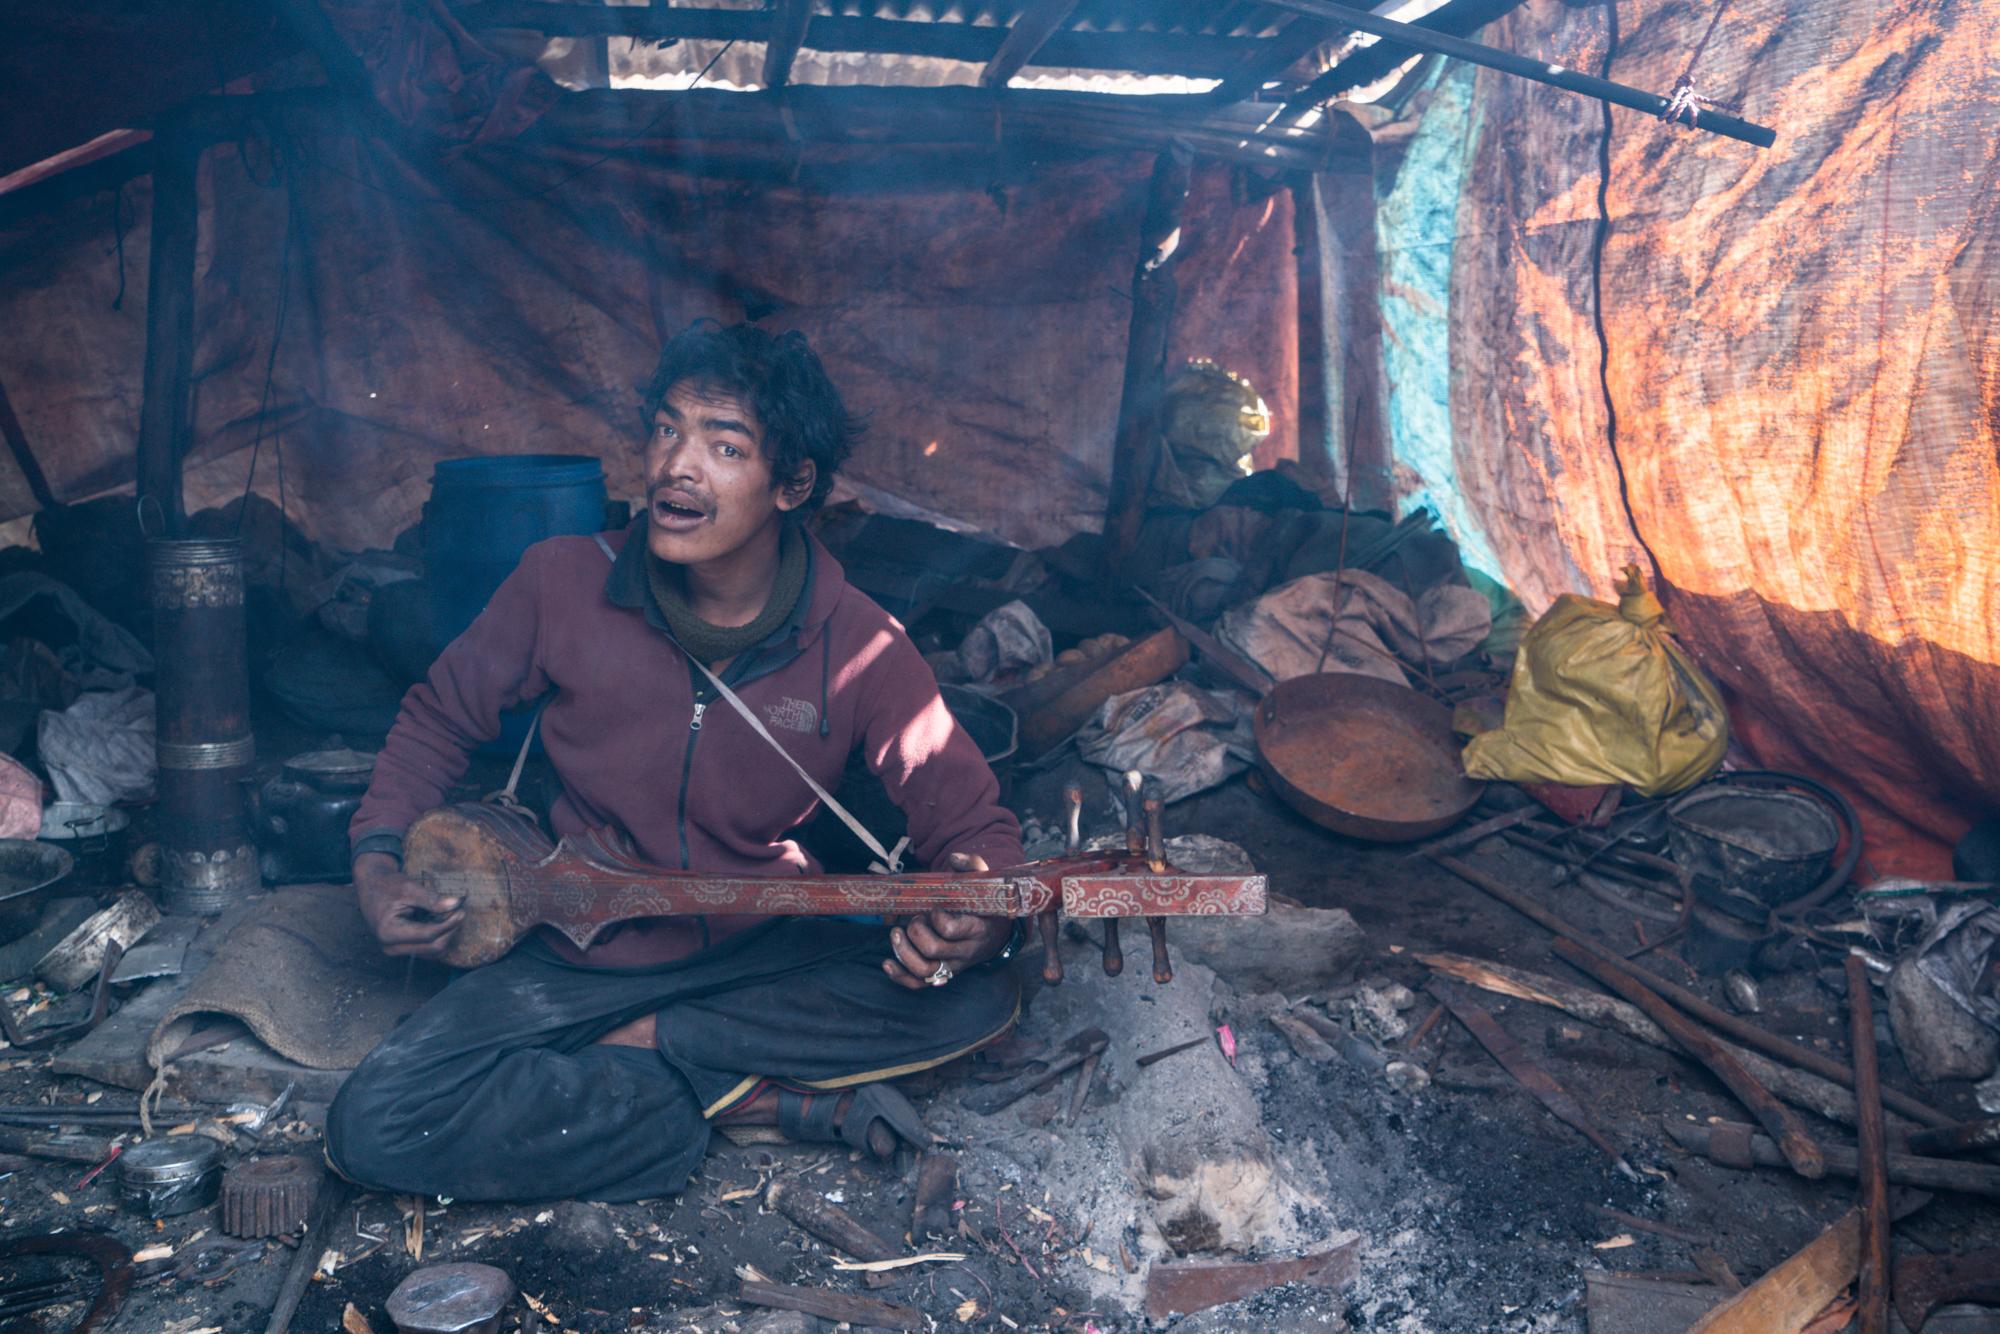 untouchable-dalit-documentary